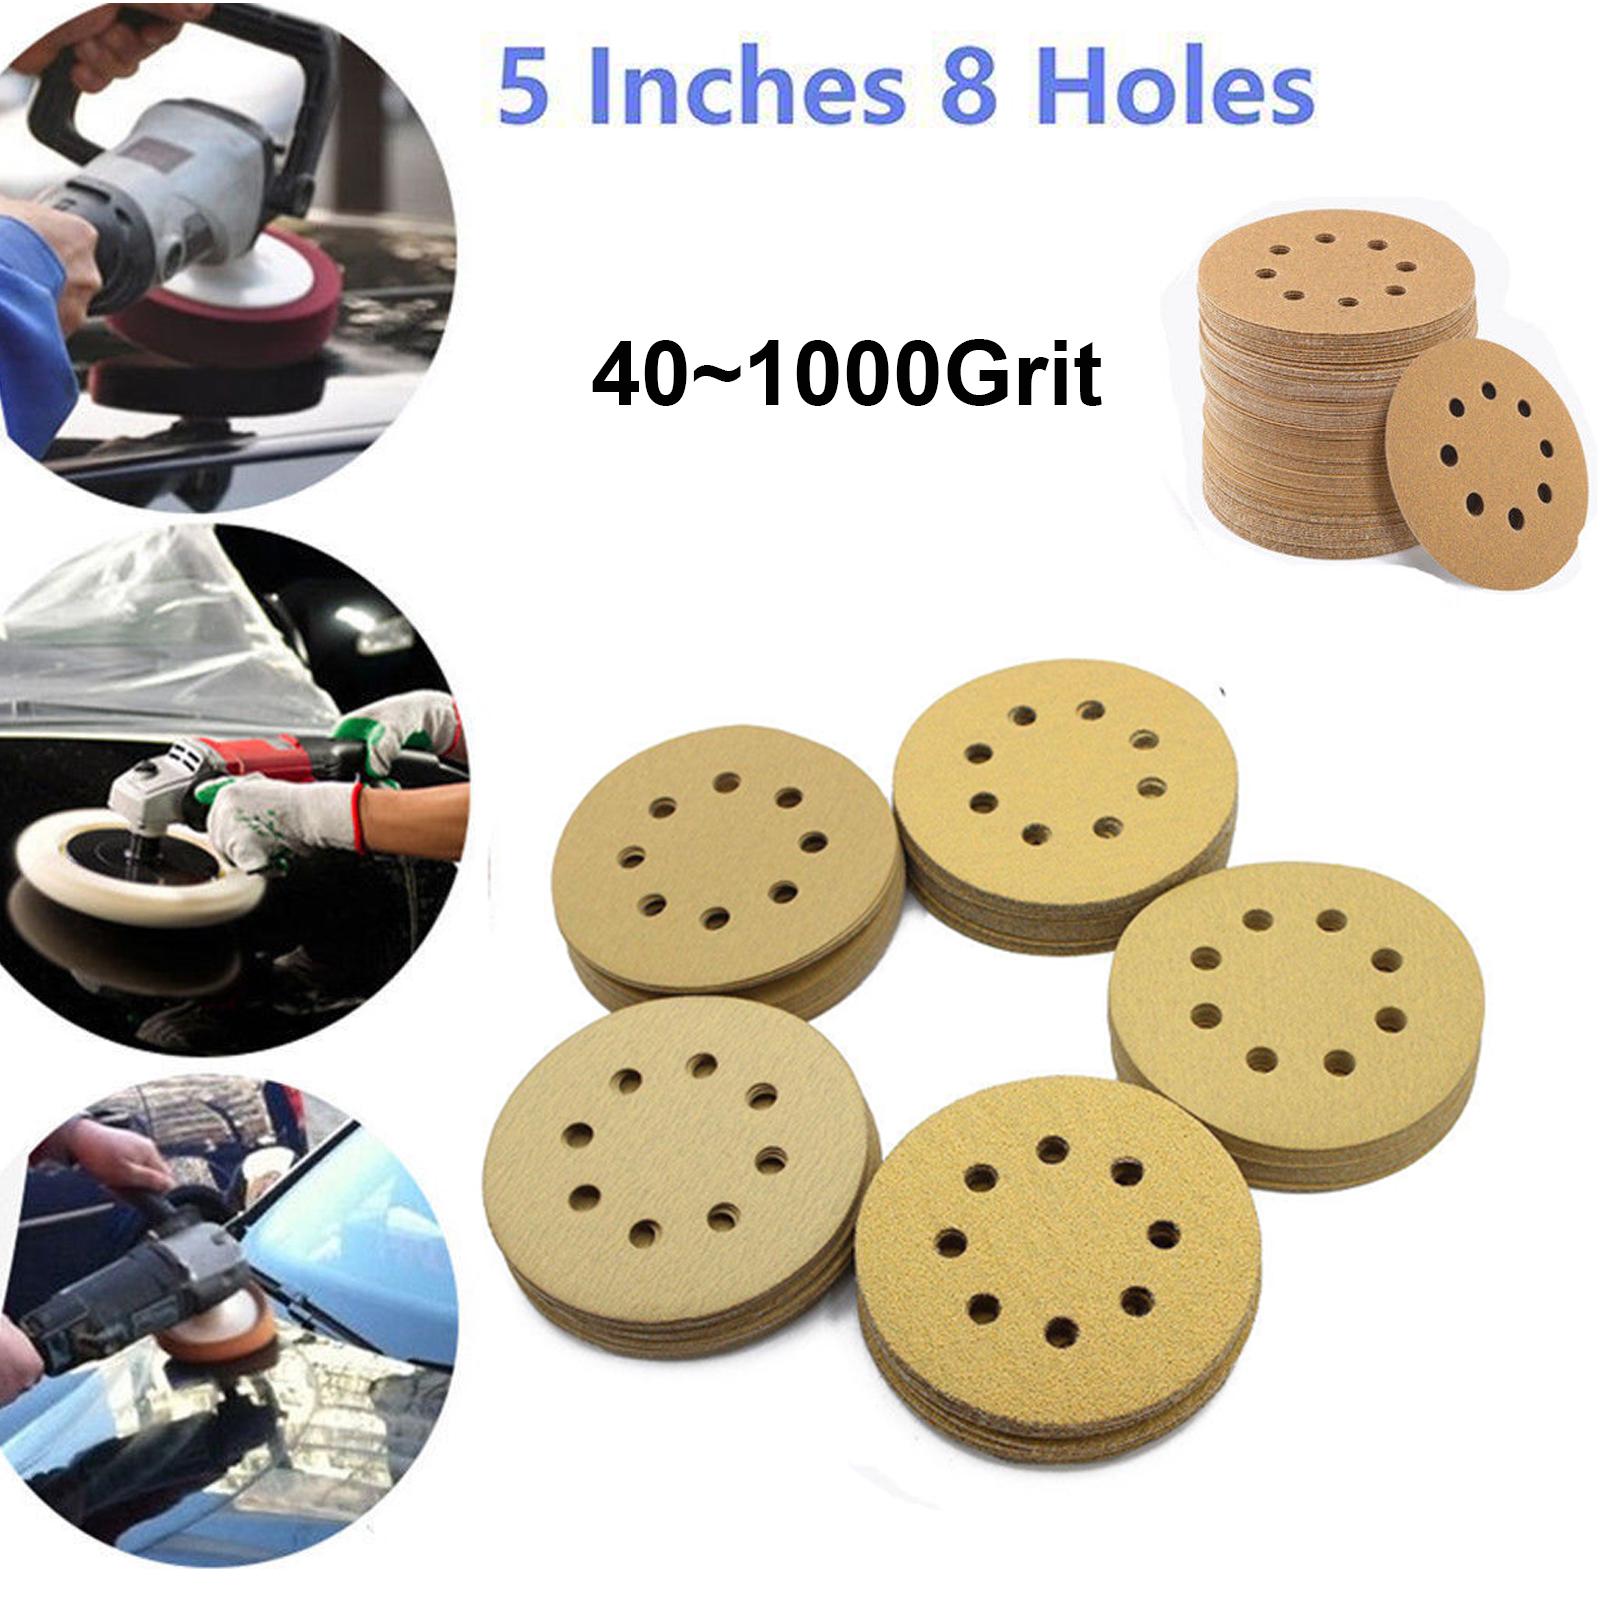 10pcs 125mm Sanding Discs Sheets Hook Loop Orbit Sander Sandpaper 40~2000 Grit